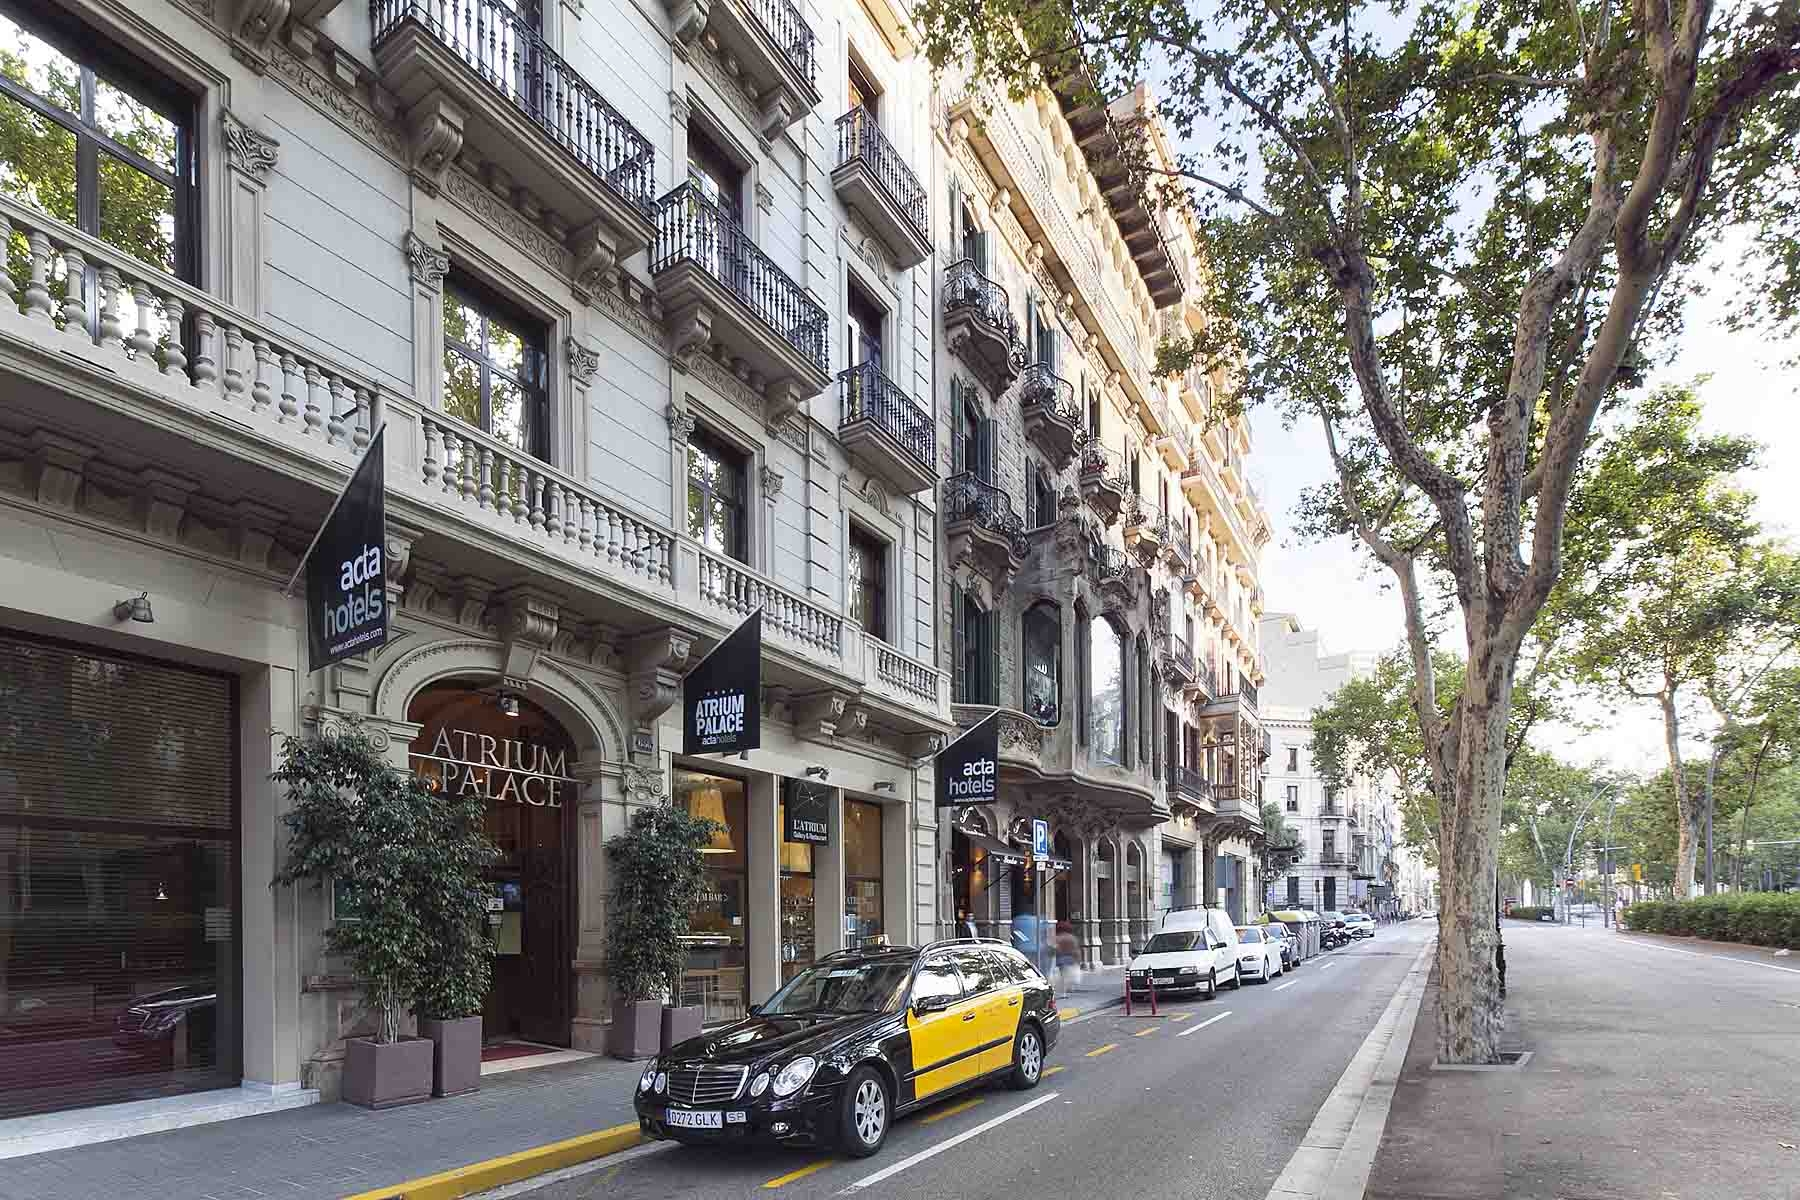 hotel_atriumpalace_exteriores